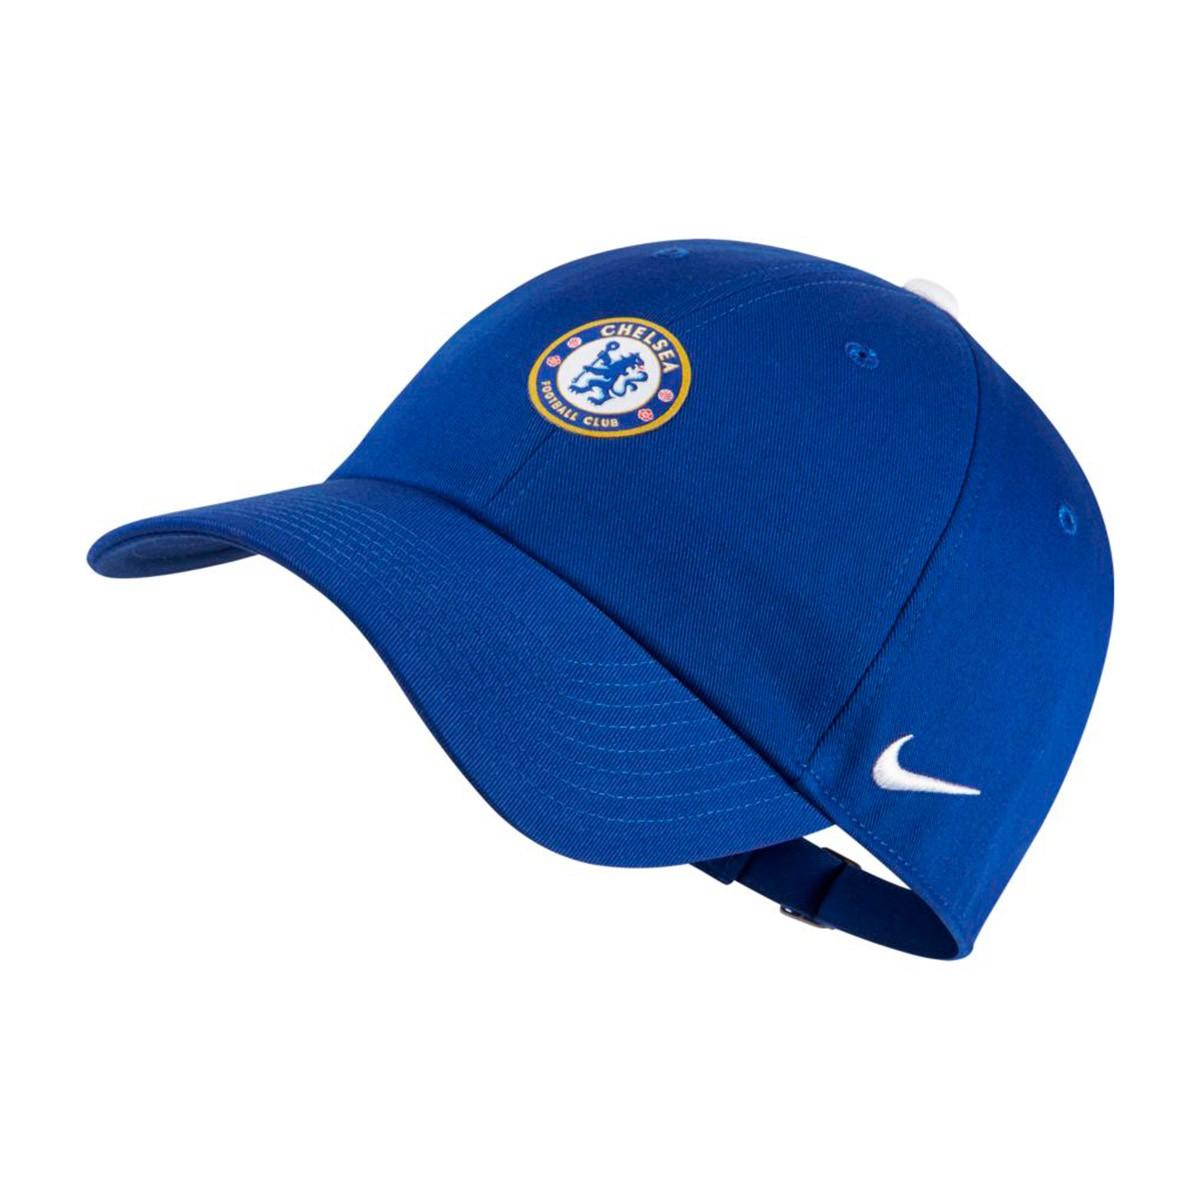 Cap Nike Chelsea FC Heritage86 2018-2019 Rush blue-White - Football ... ad51550cb30a